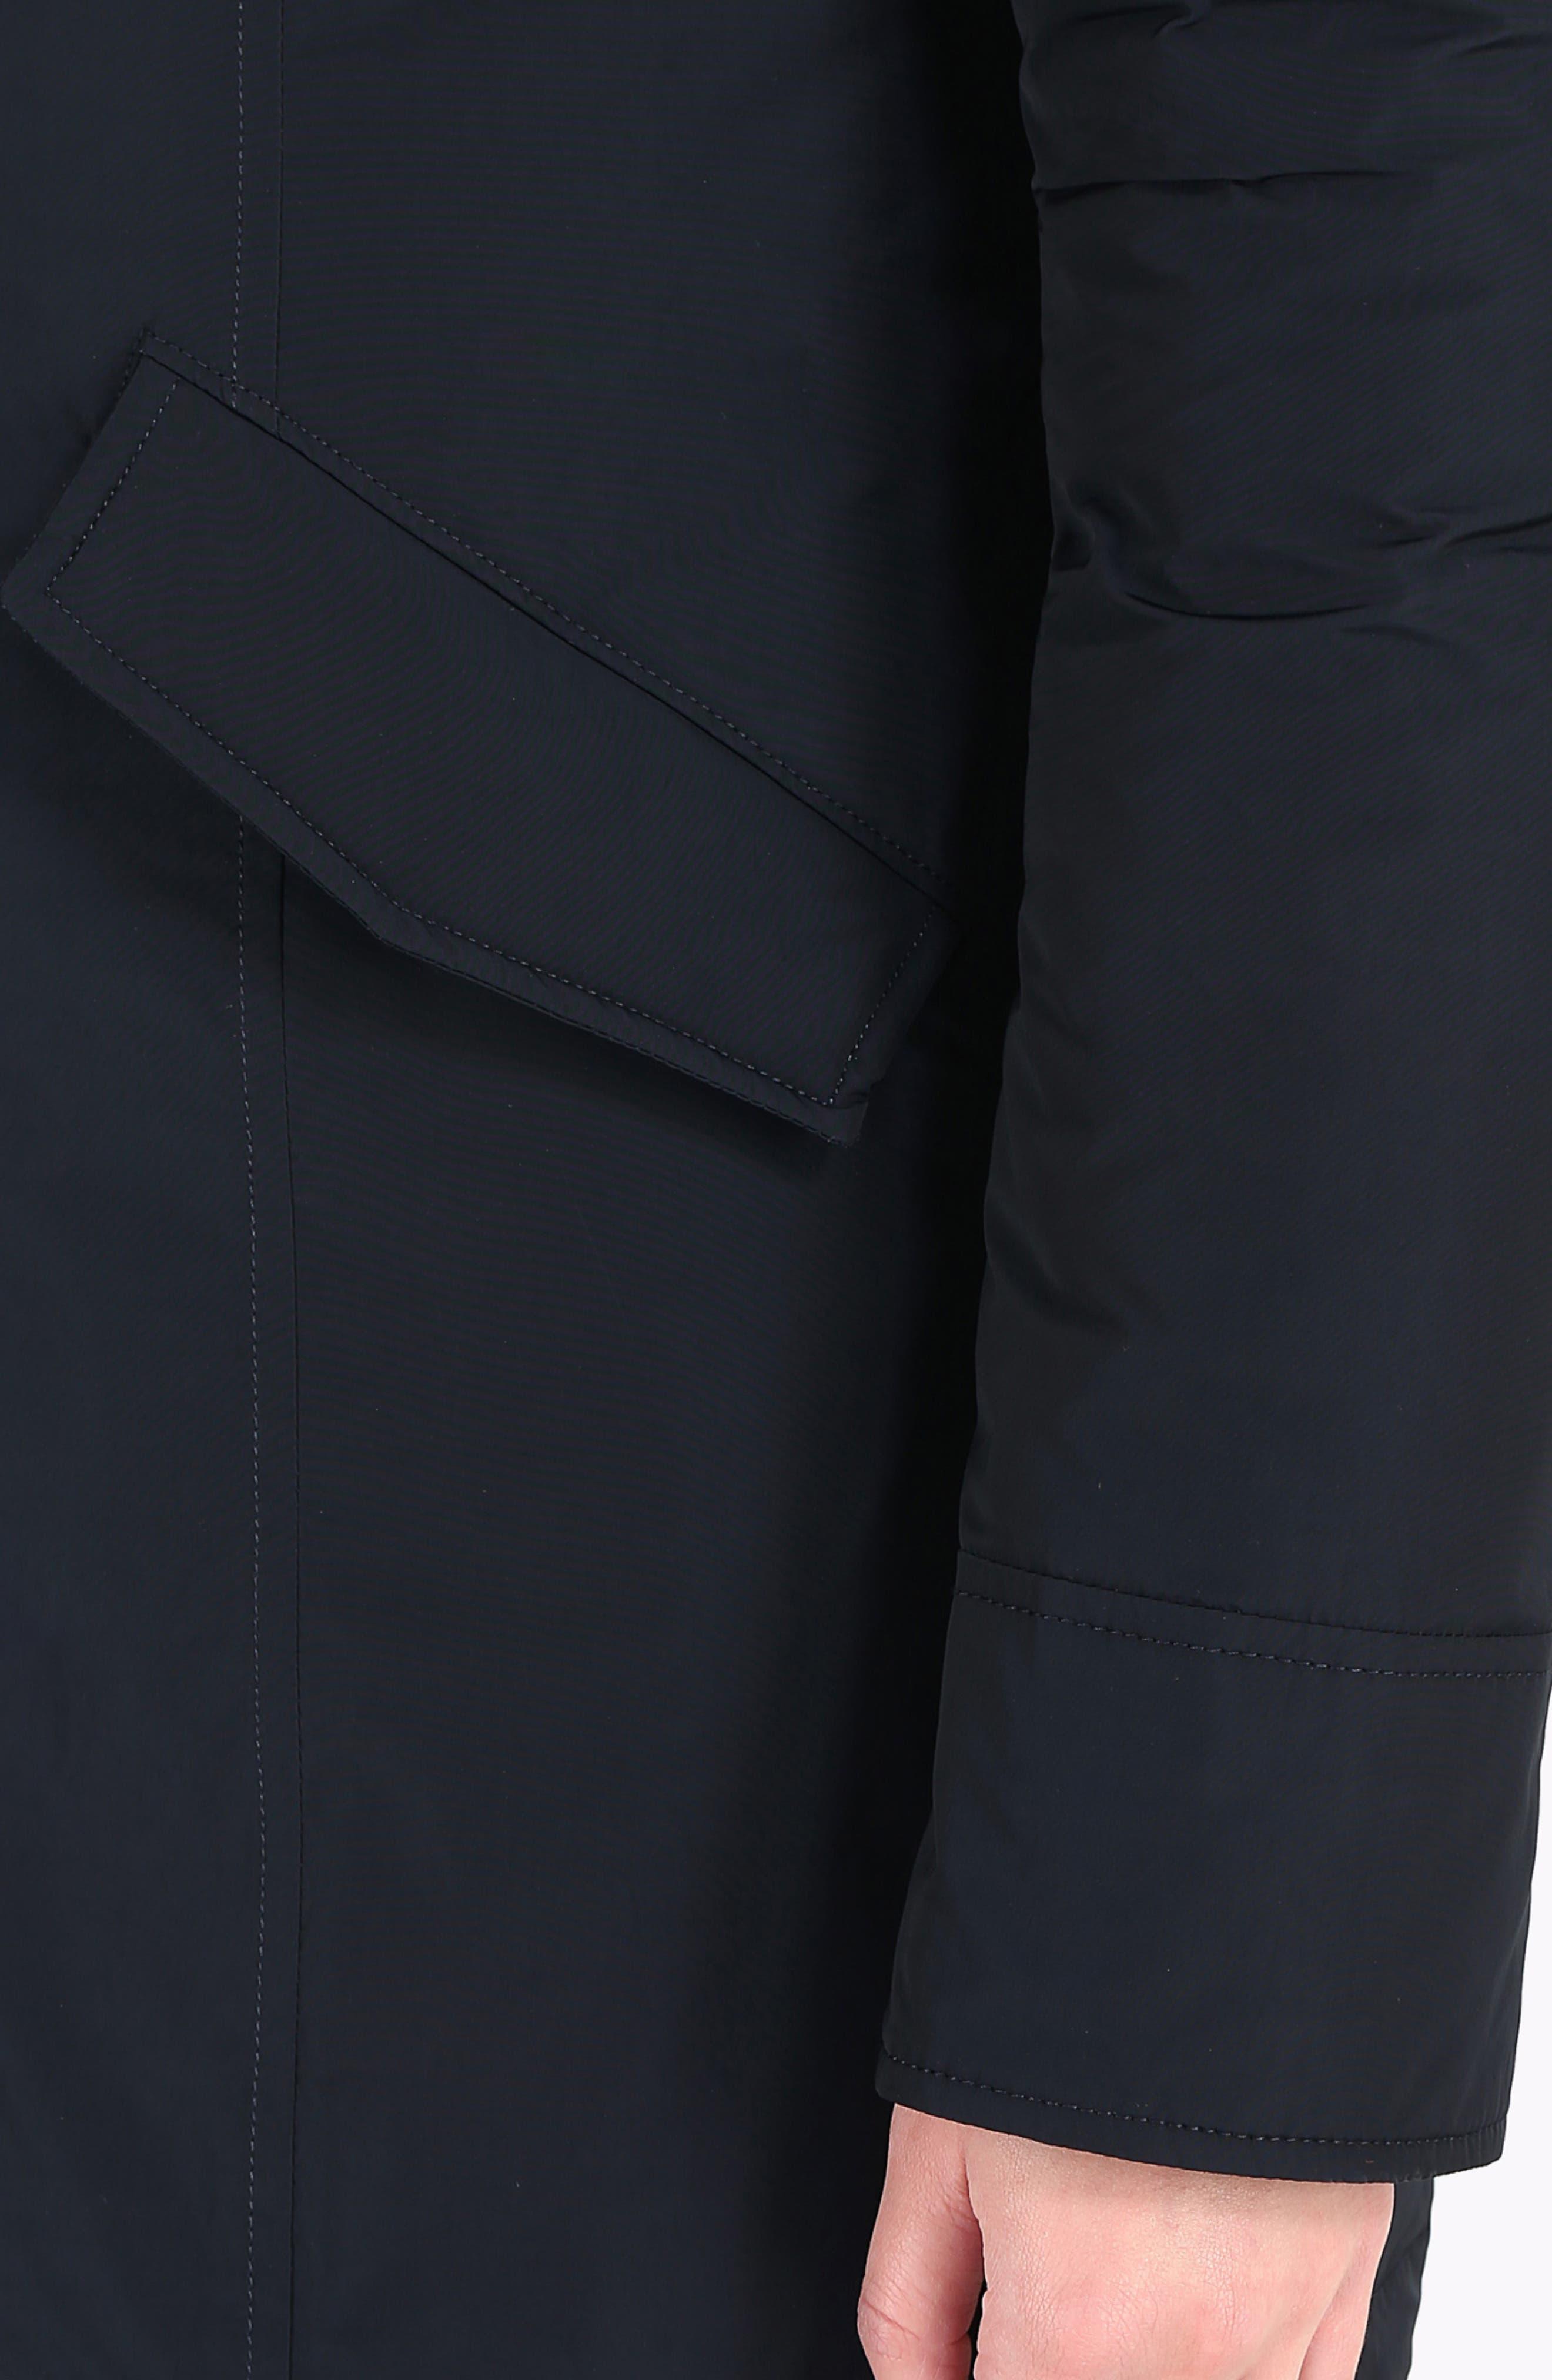 Luxury Arctic Down Parka with Genuine Fox Fur Trim,                             Alternate thumbnail 8, color,                             MIDNIGHT BLUE